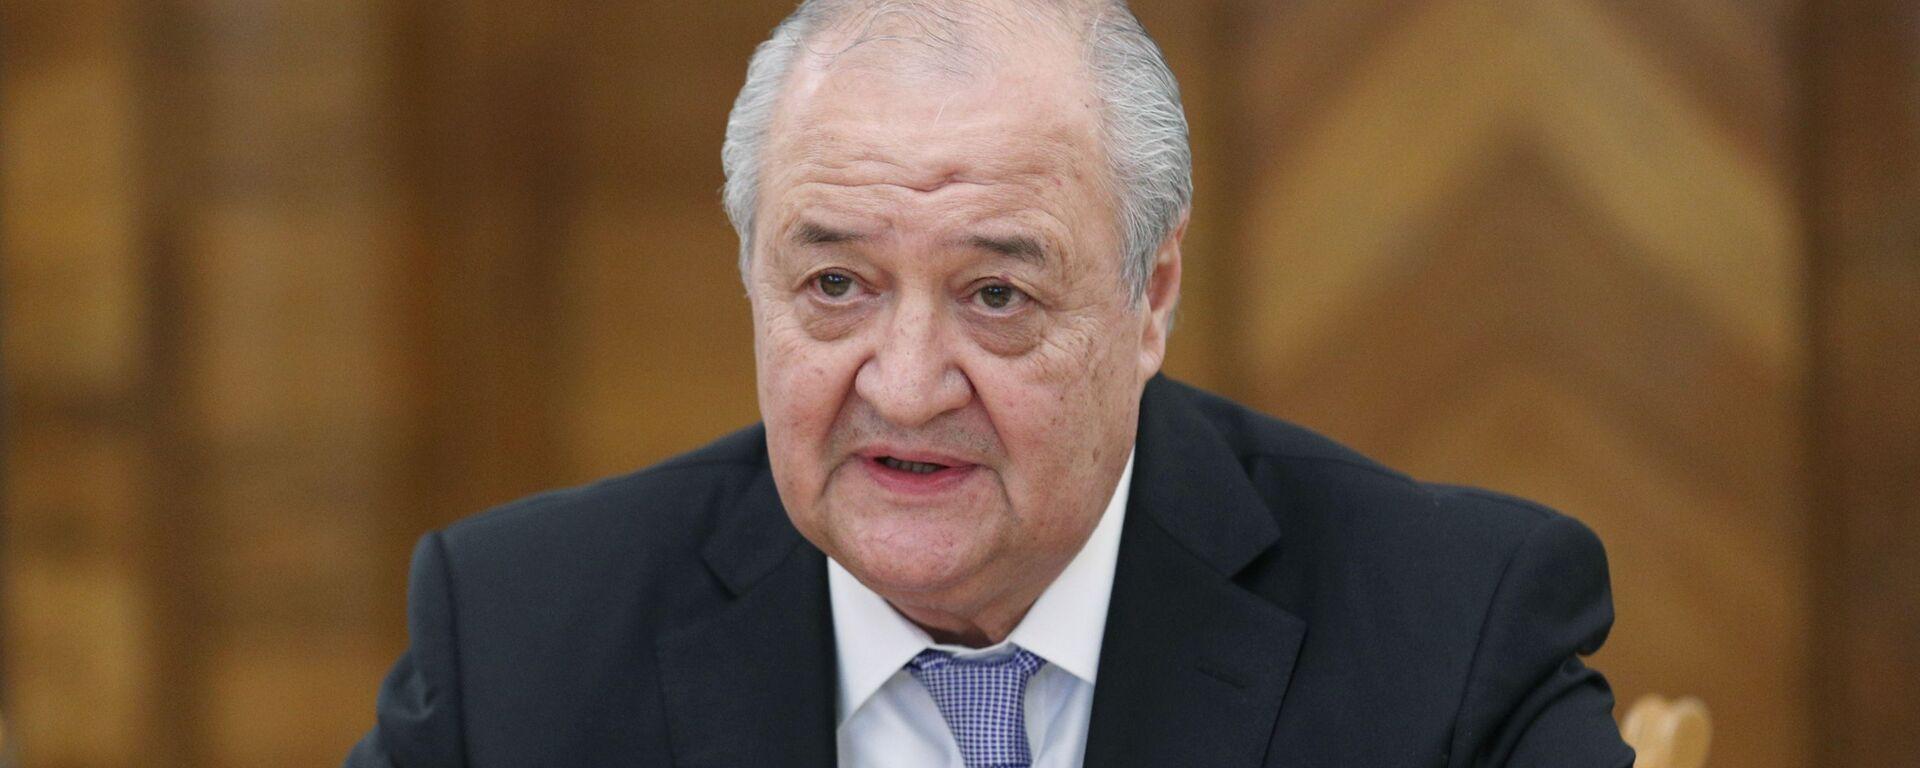 Министр иностранных дел Узбекистана Абдулазиз Камилов - Sputnik Узбекистан, 1920, 14.07.2021